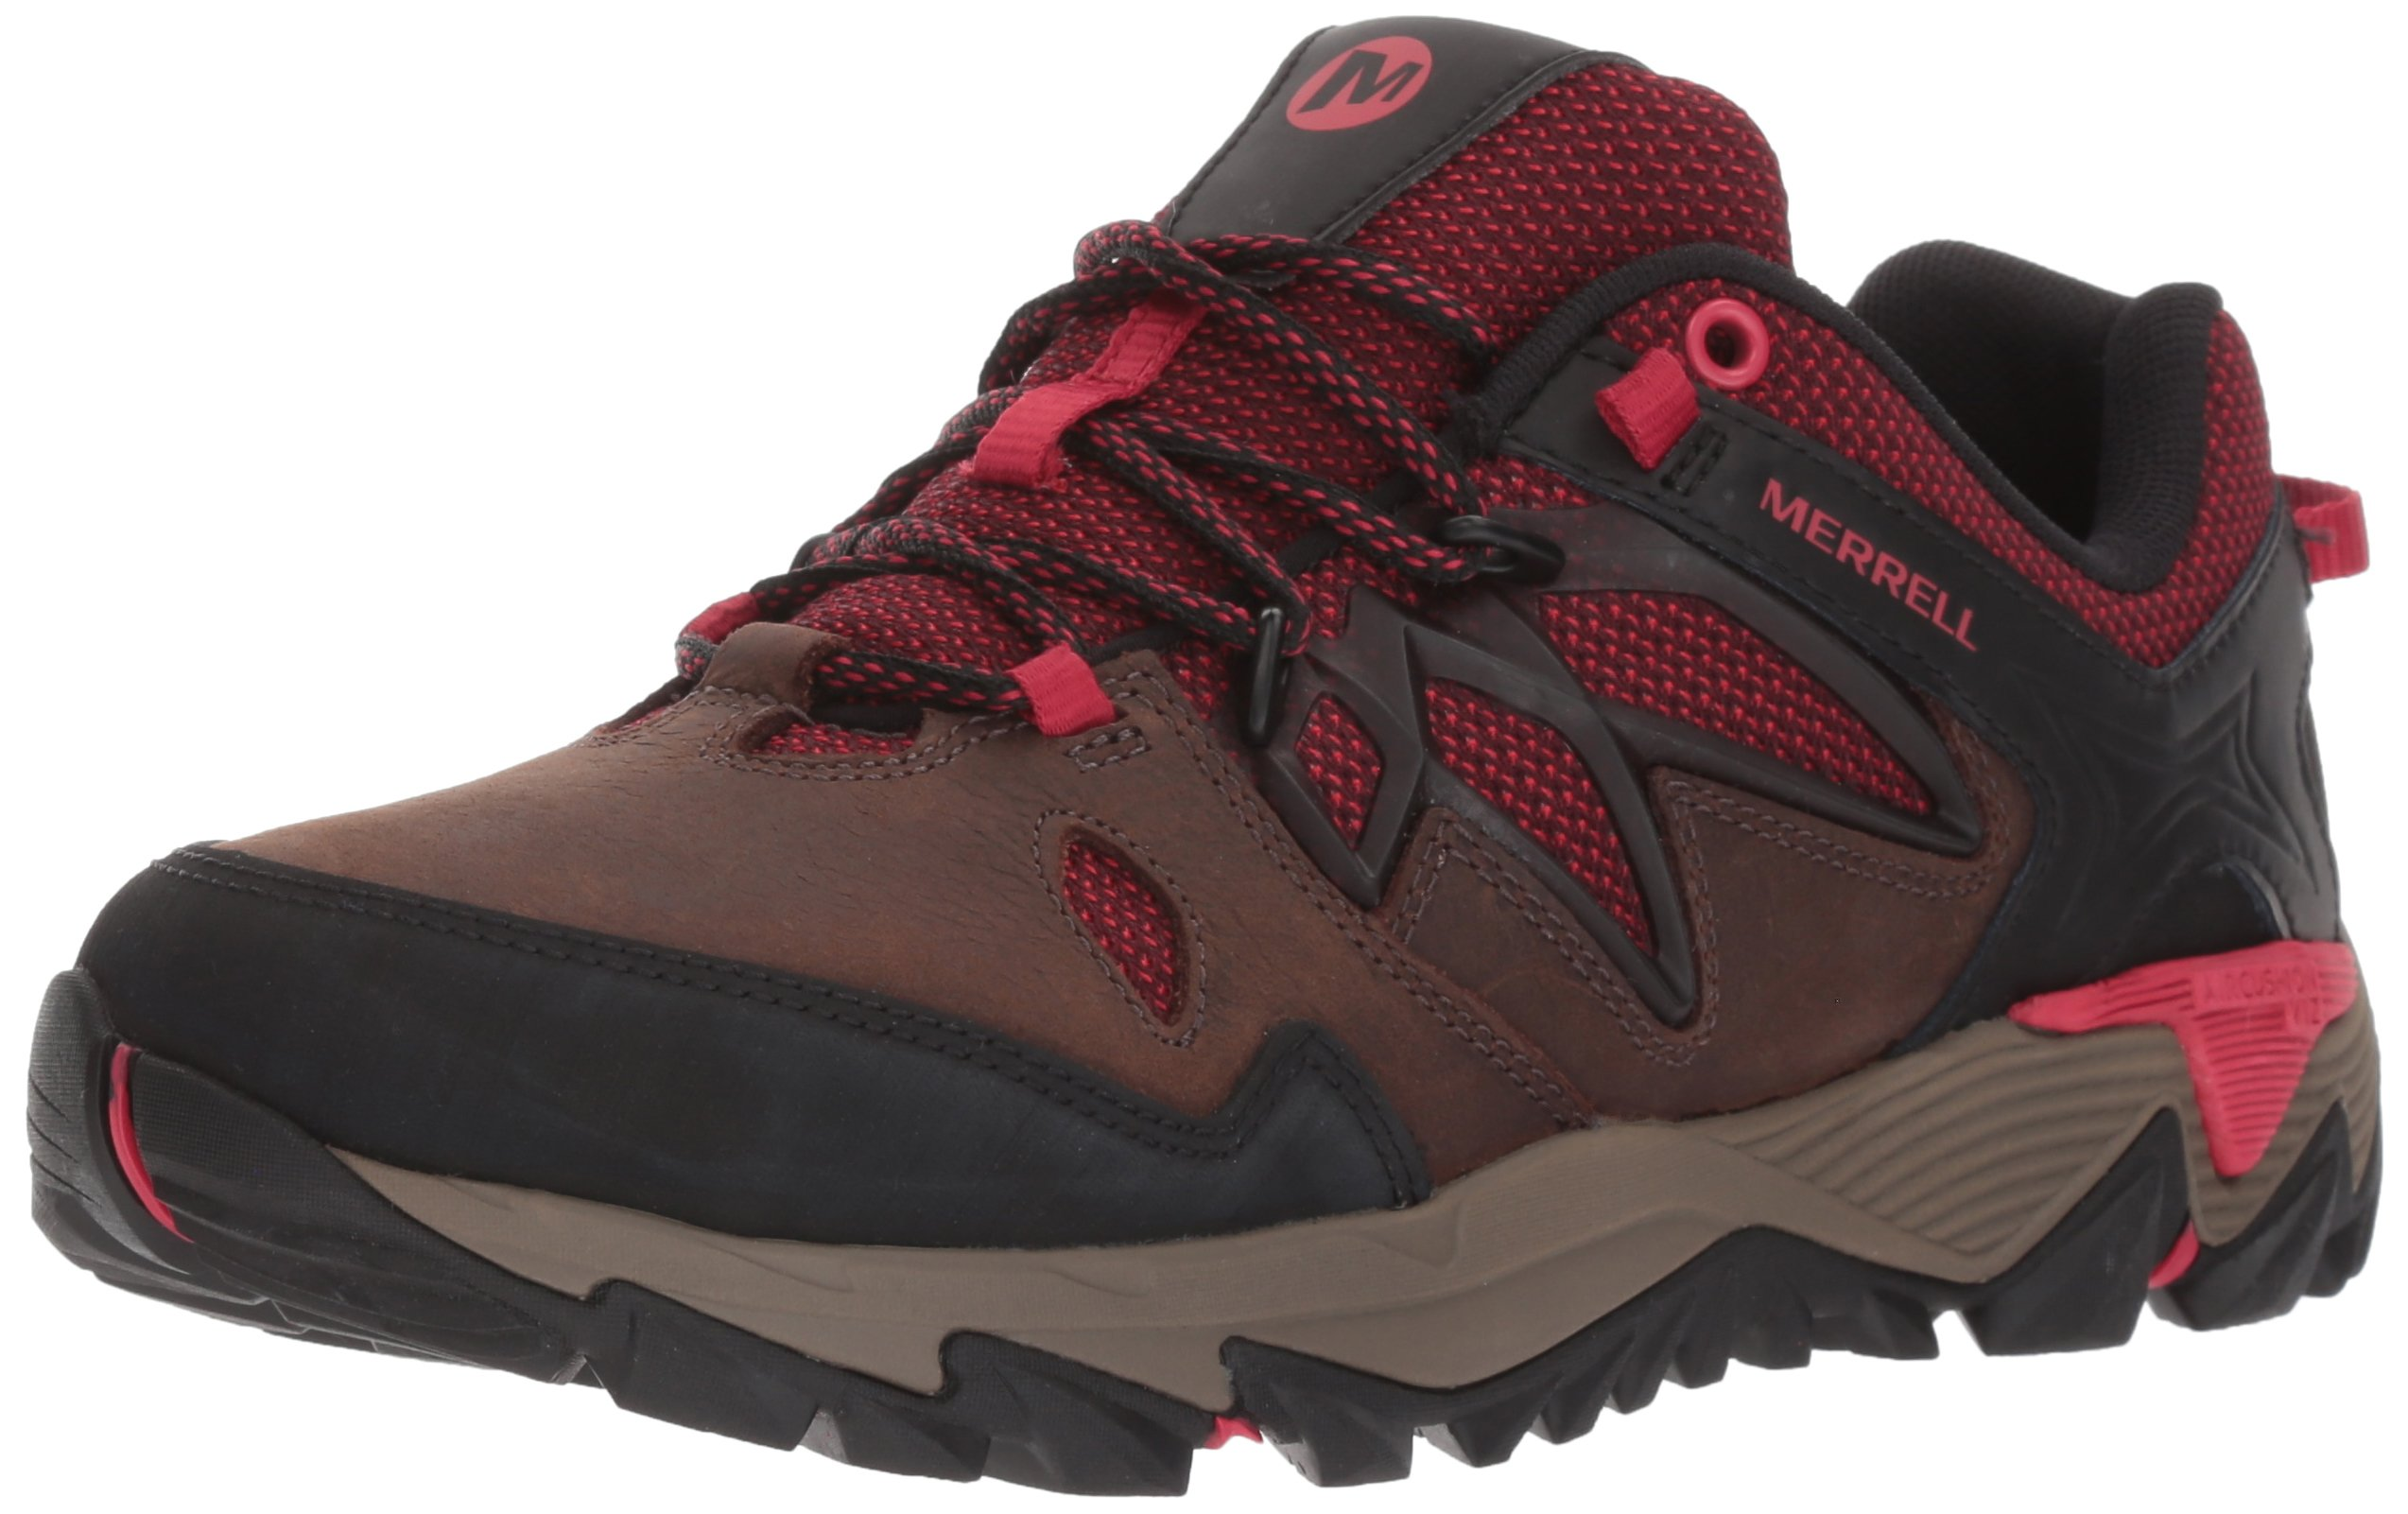 Merrell Women's All Out Blaze 2 Hiking Shoe, Cinnamon, 9 M US